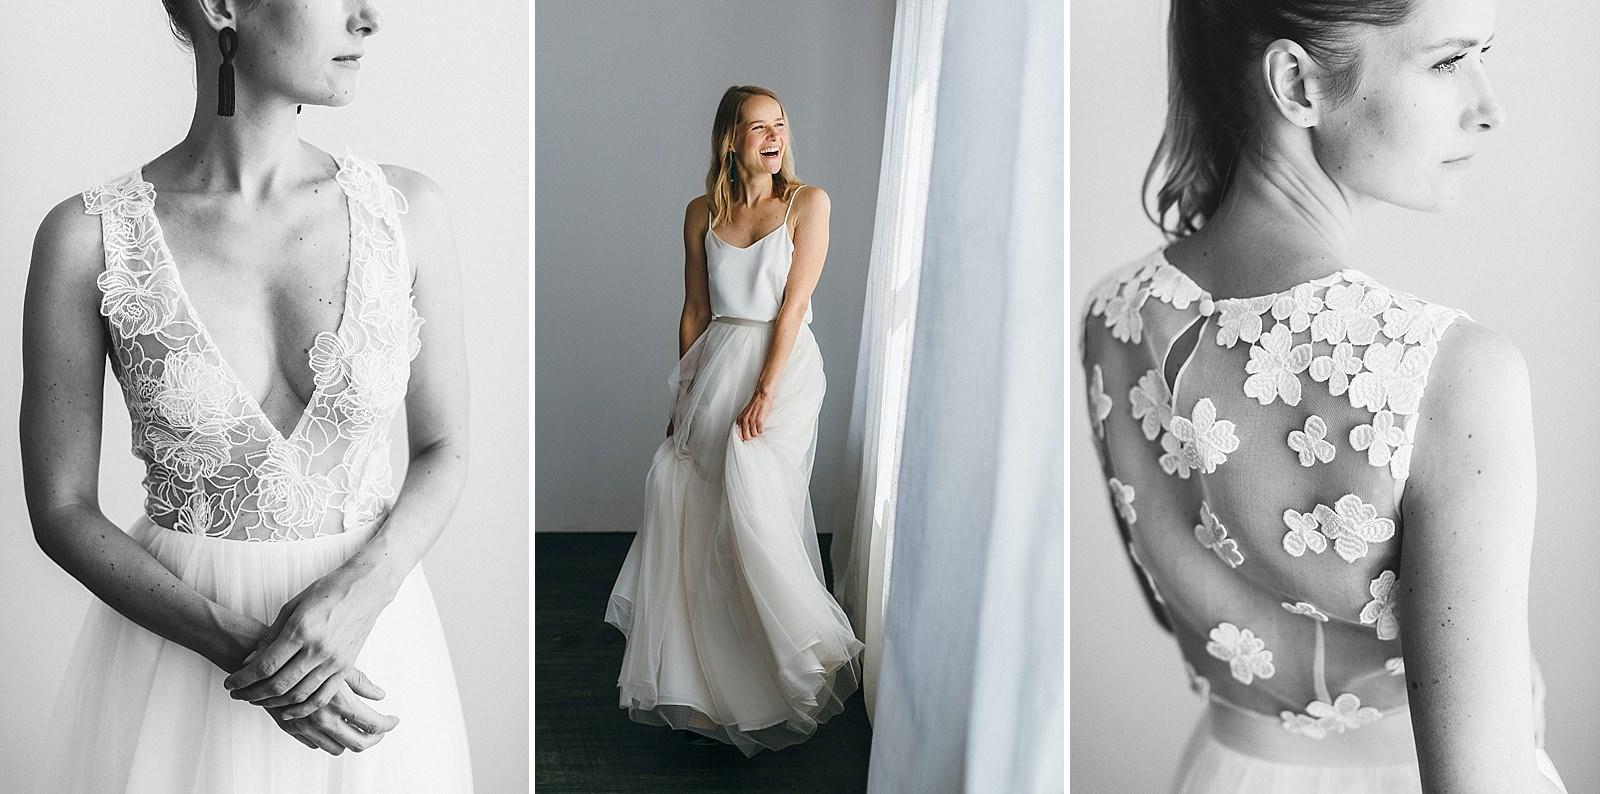 nala-bridal-couture-005.jpg